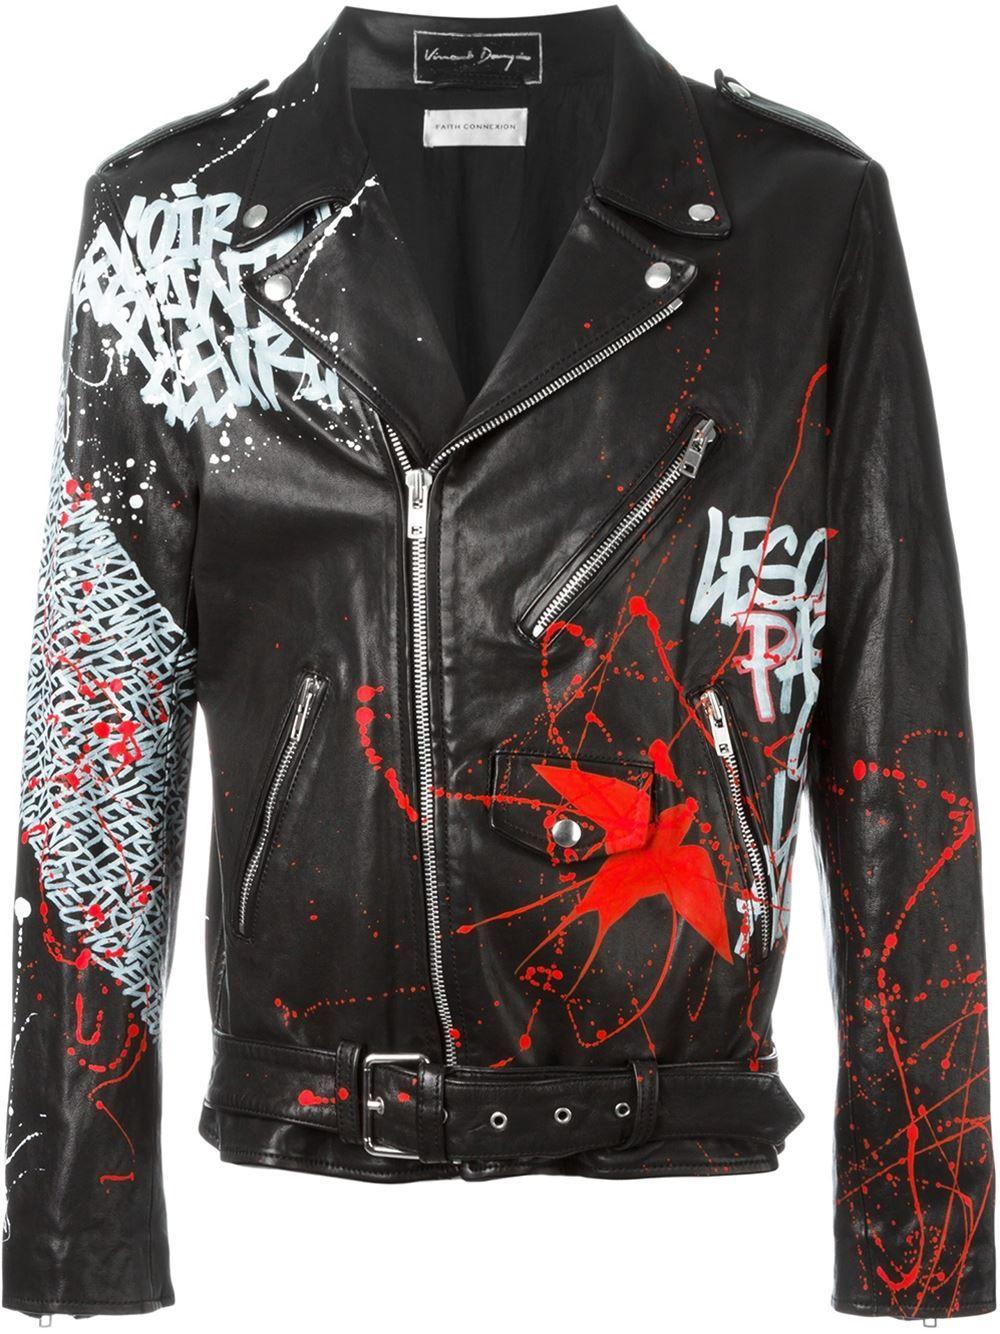 Faith Connexion grafitti biker jacket Custom leather